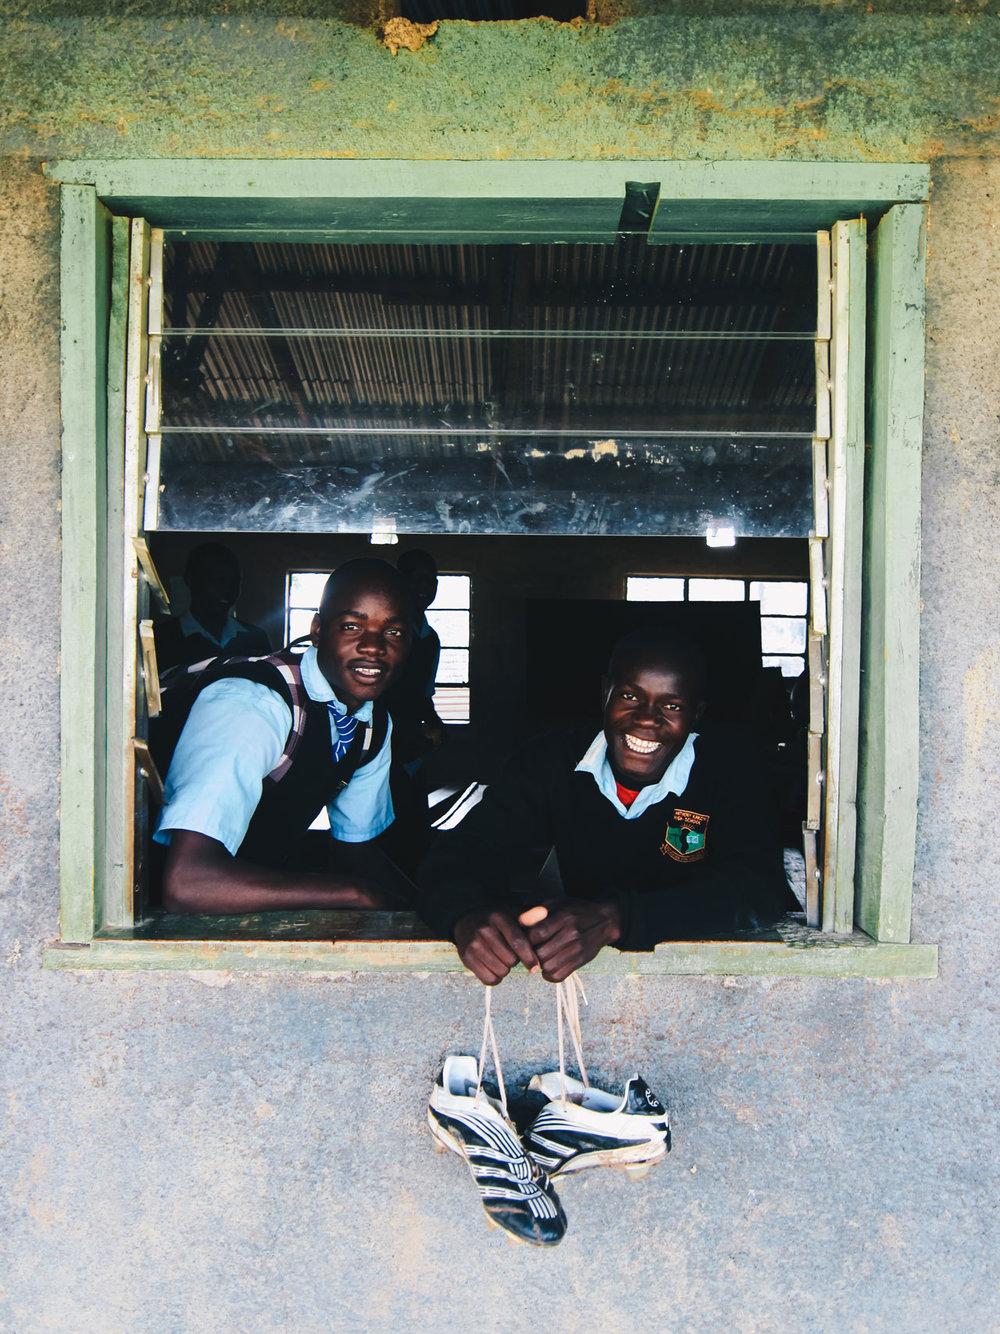 kenya-journals-boys-window-crossbar.jpg